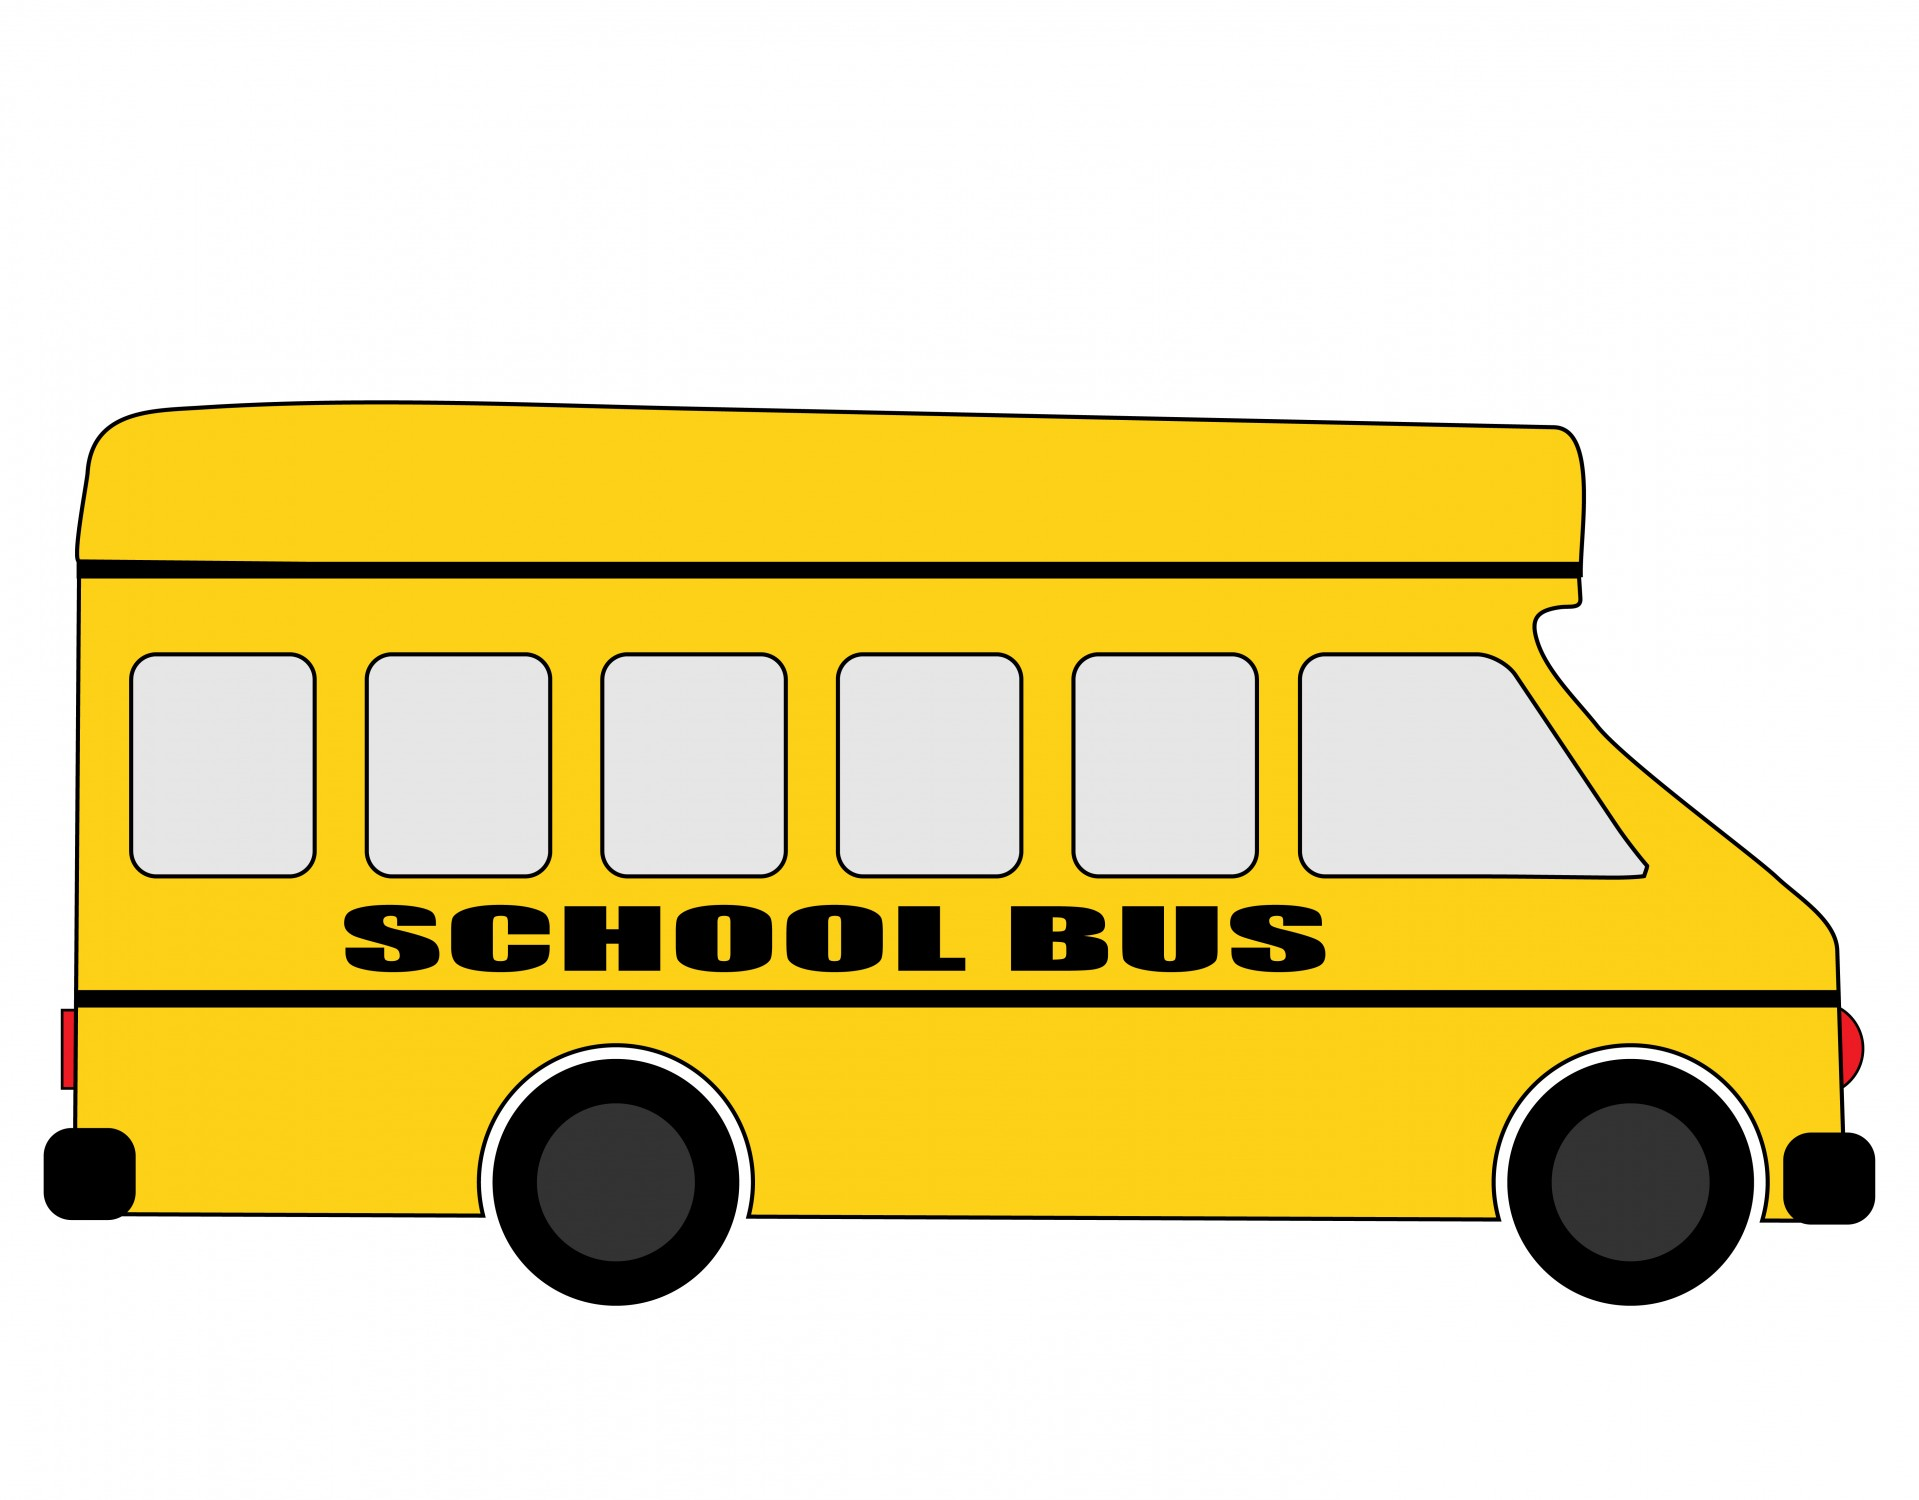 School Bus Clipart by Karen Arnold 1919x1500